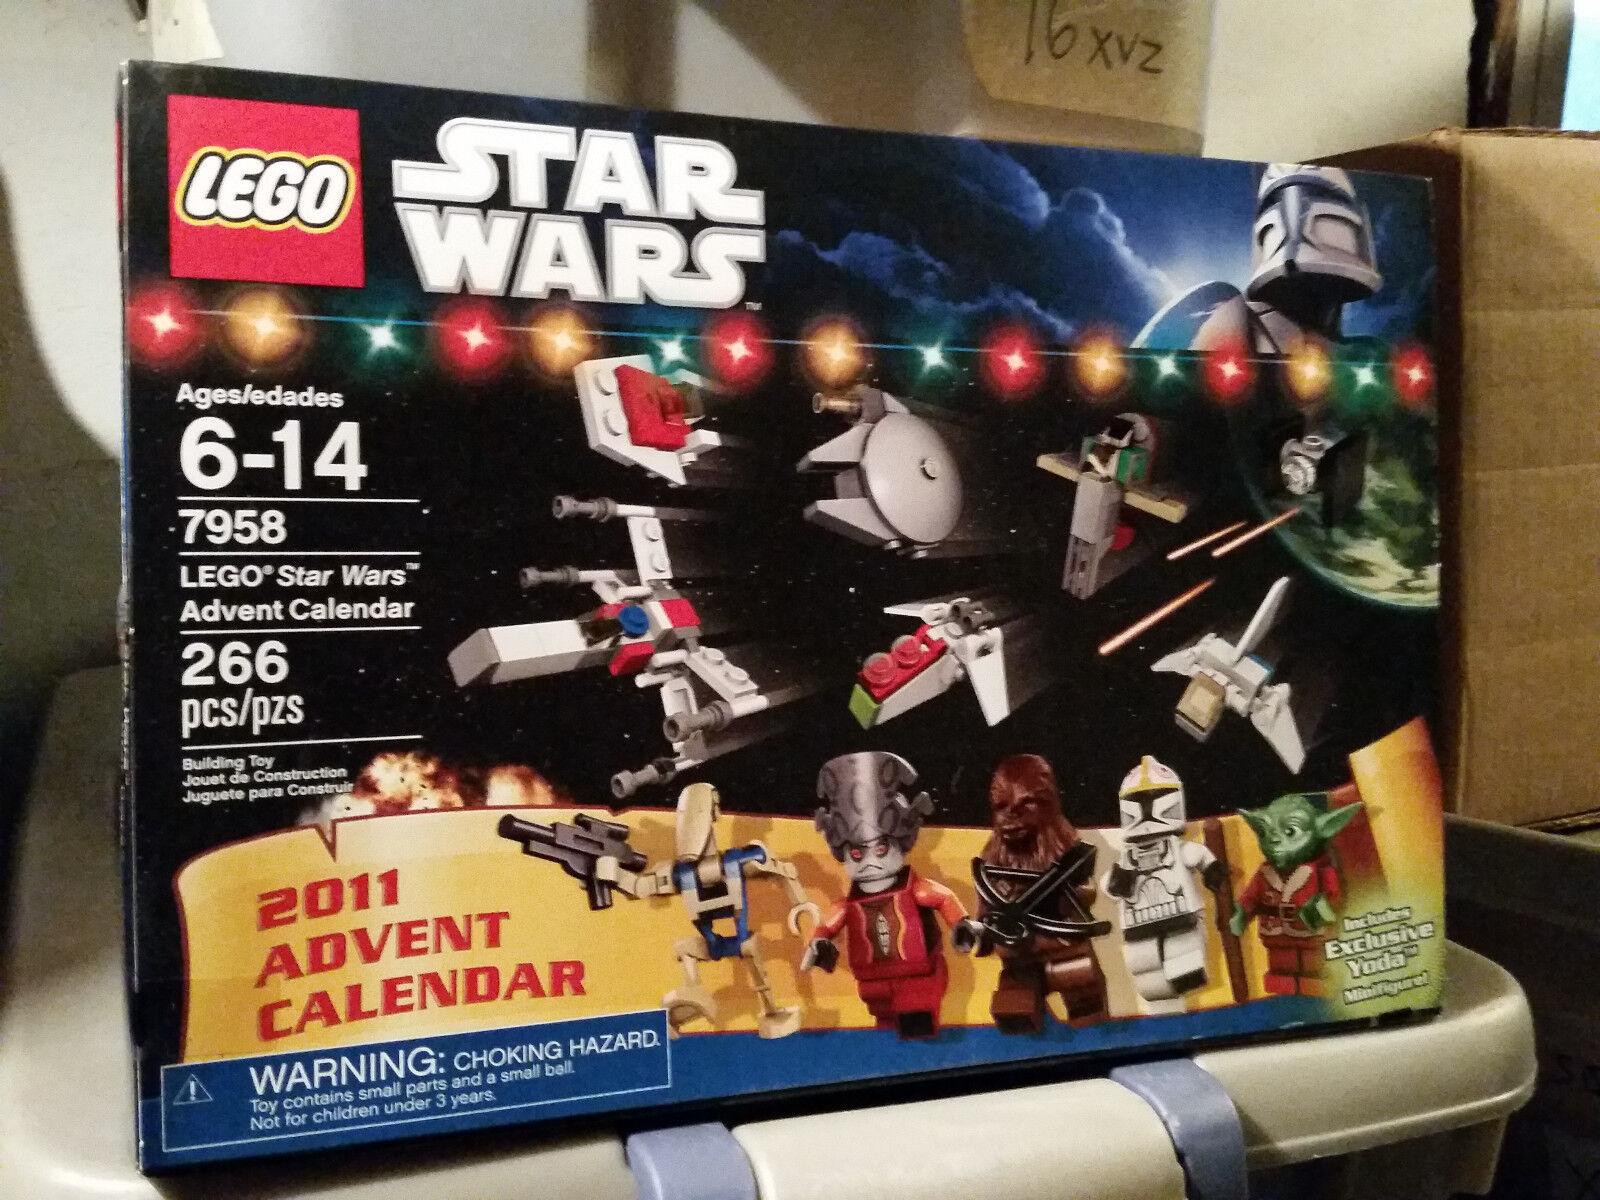 STAR WARS Lego 7958 CHRISTMAS ADVENT CALENDER Minifigure Yoda Pilot Tie